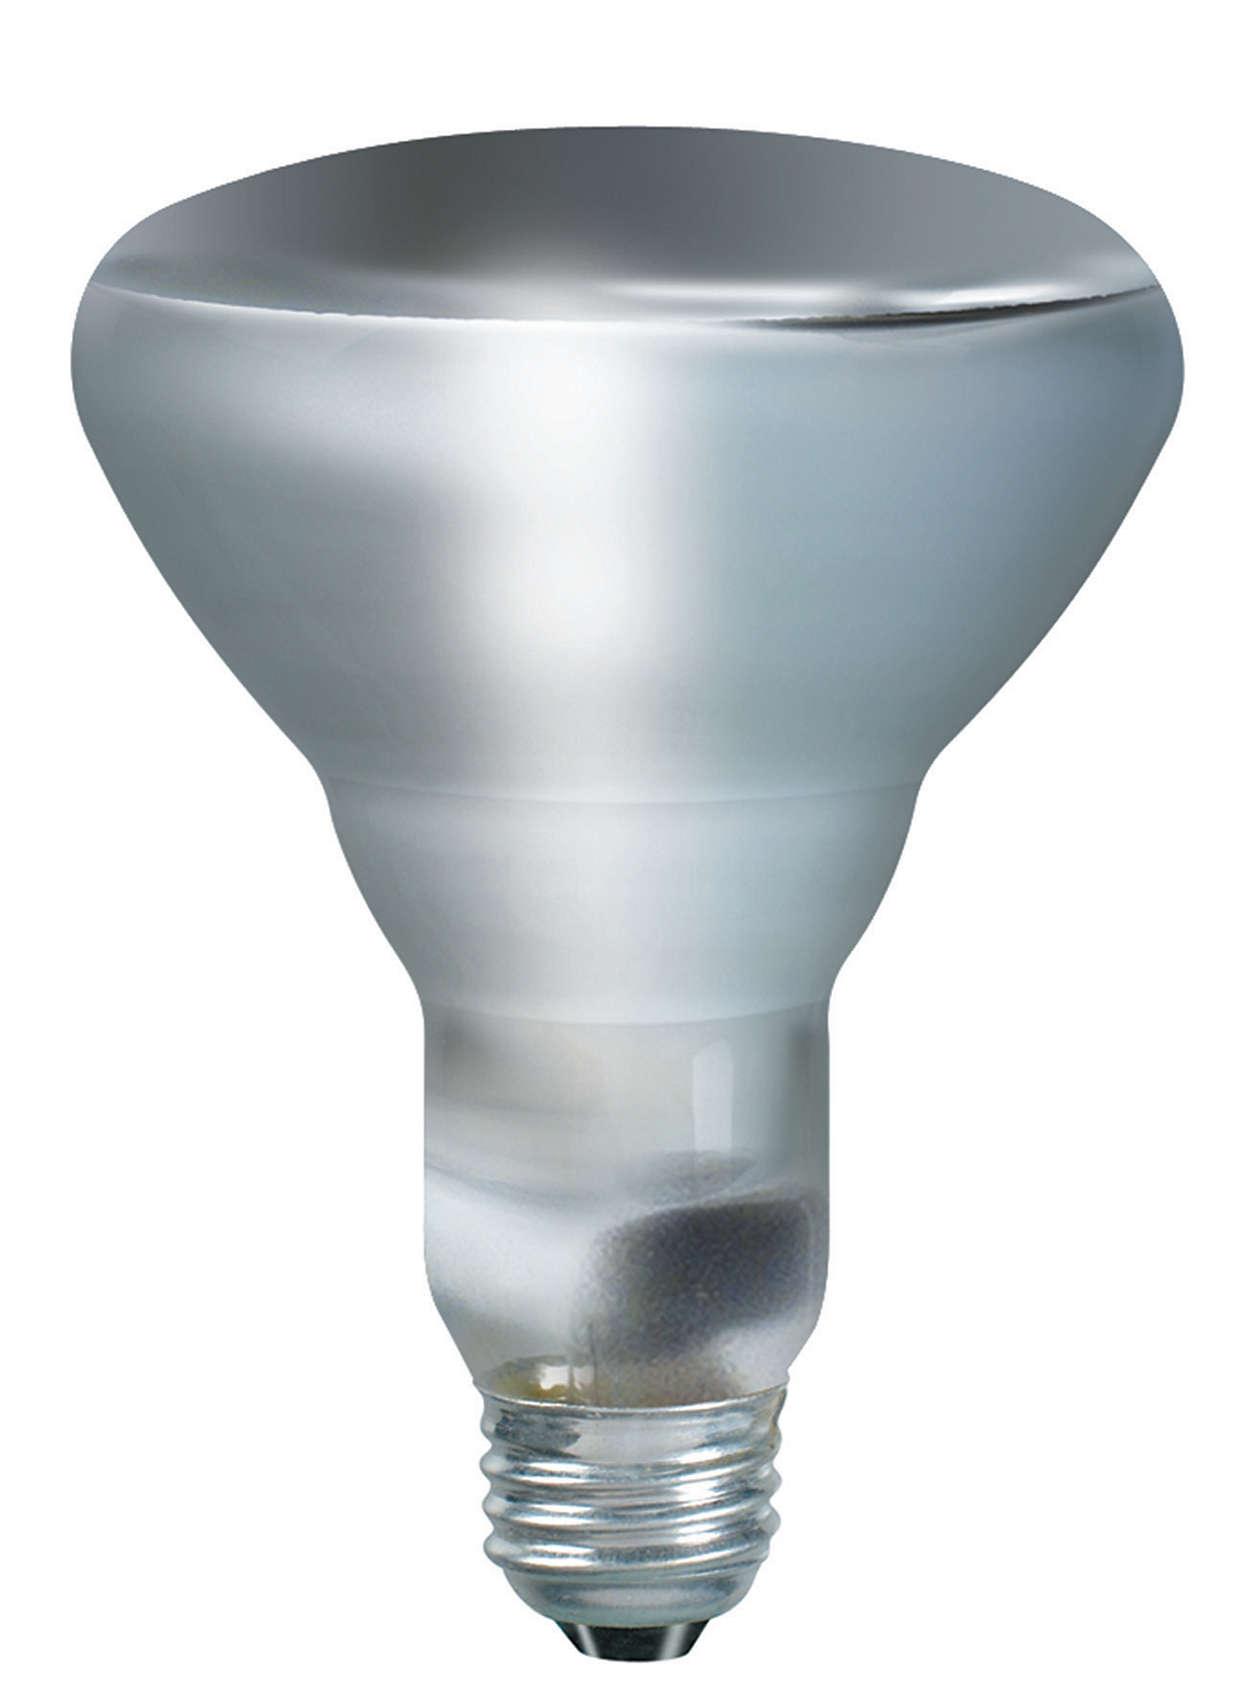 DuraMax Reflector Spot